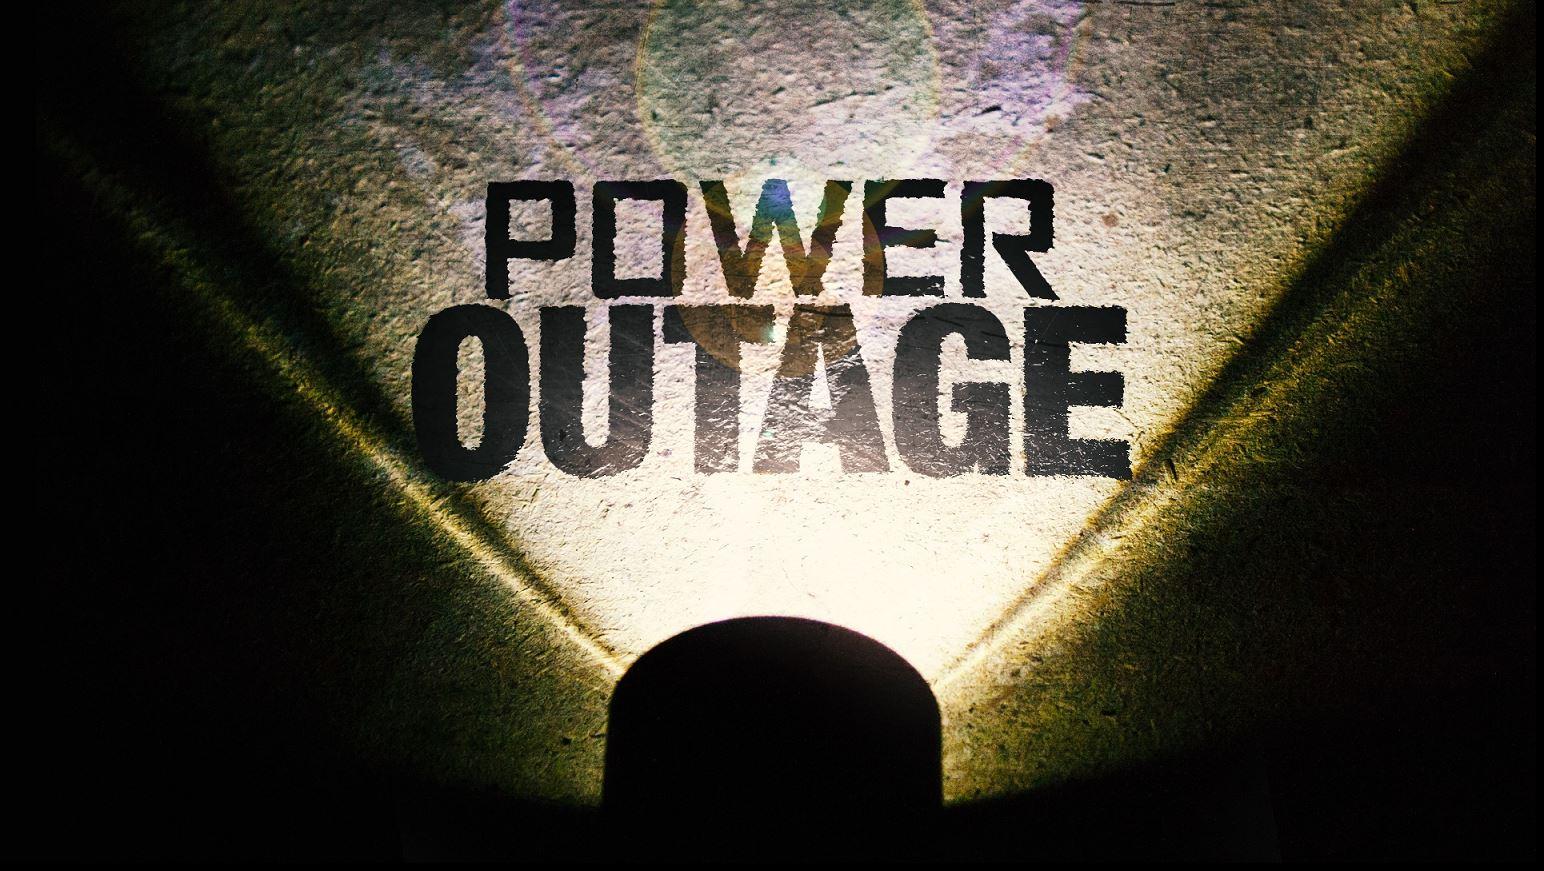 power outage_1536847478770.JPG-873810377.jpg